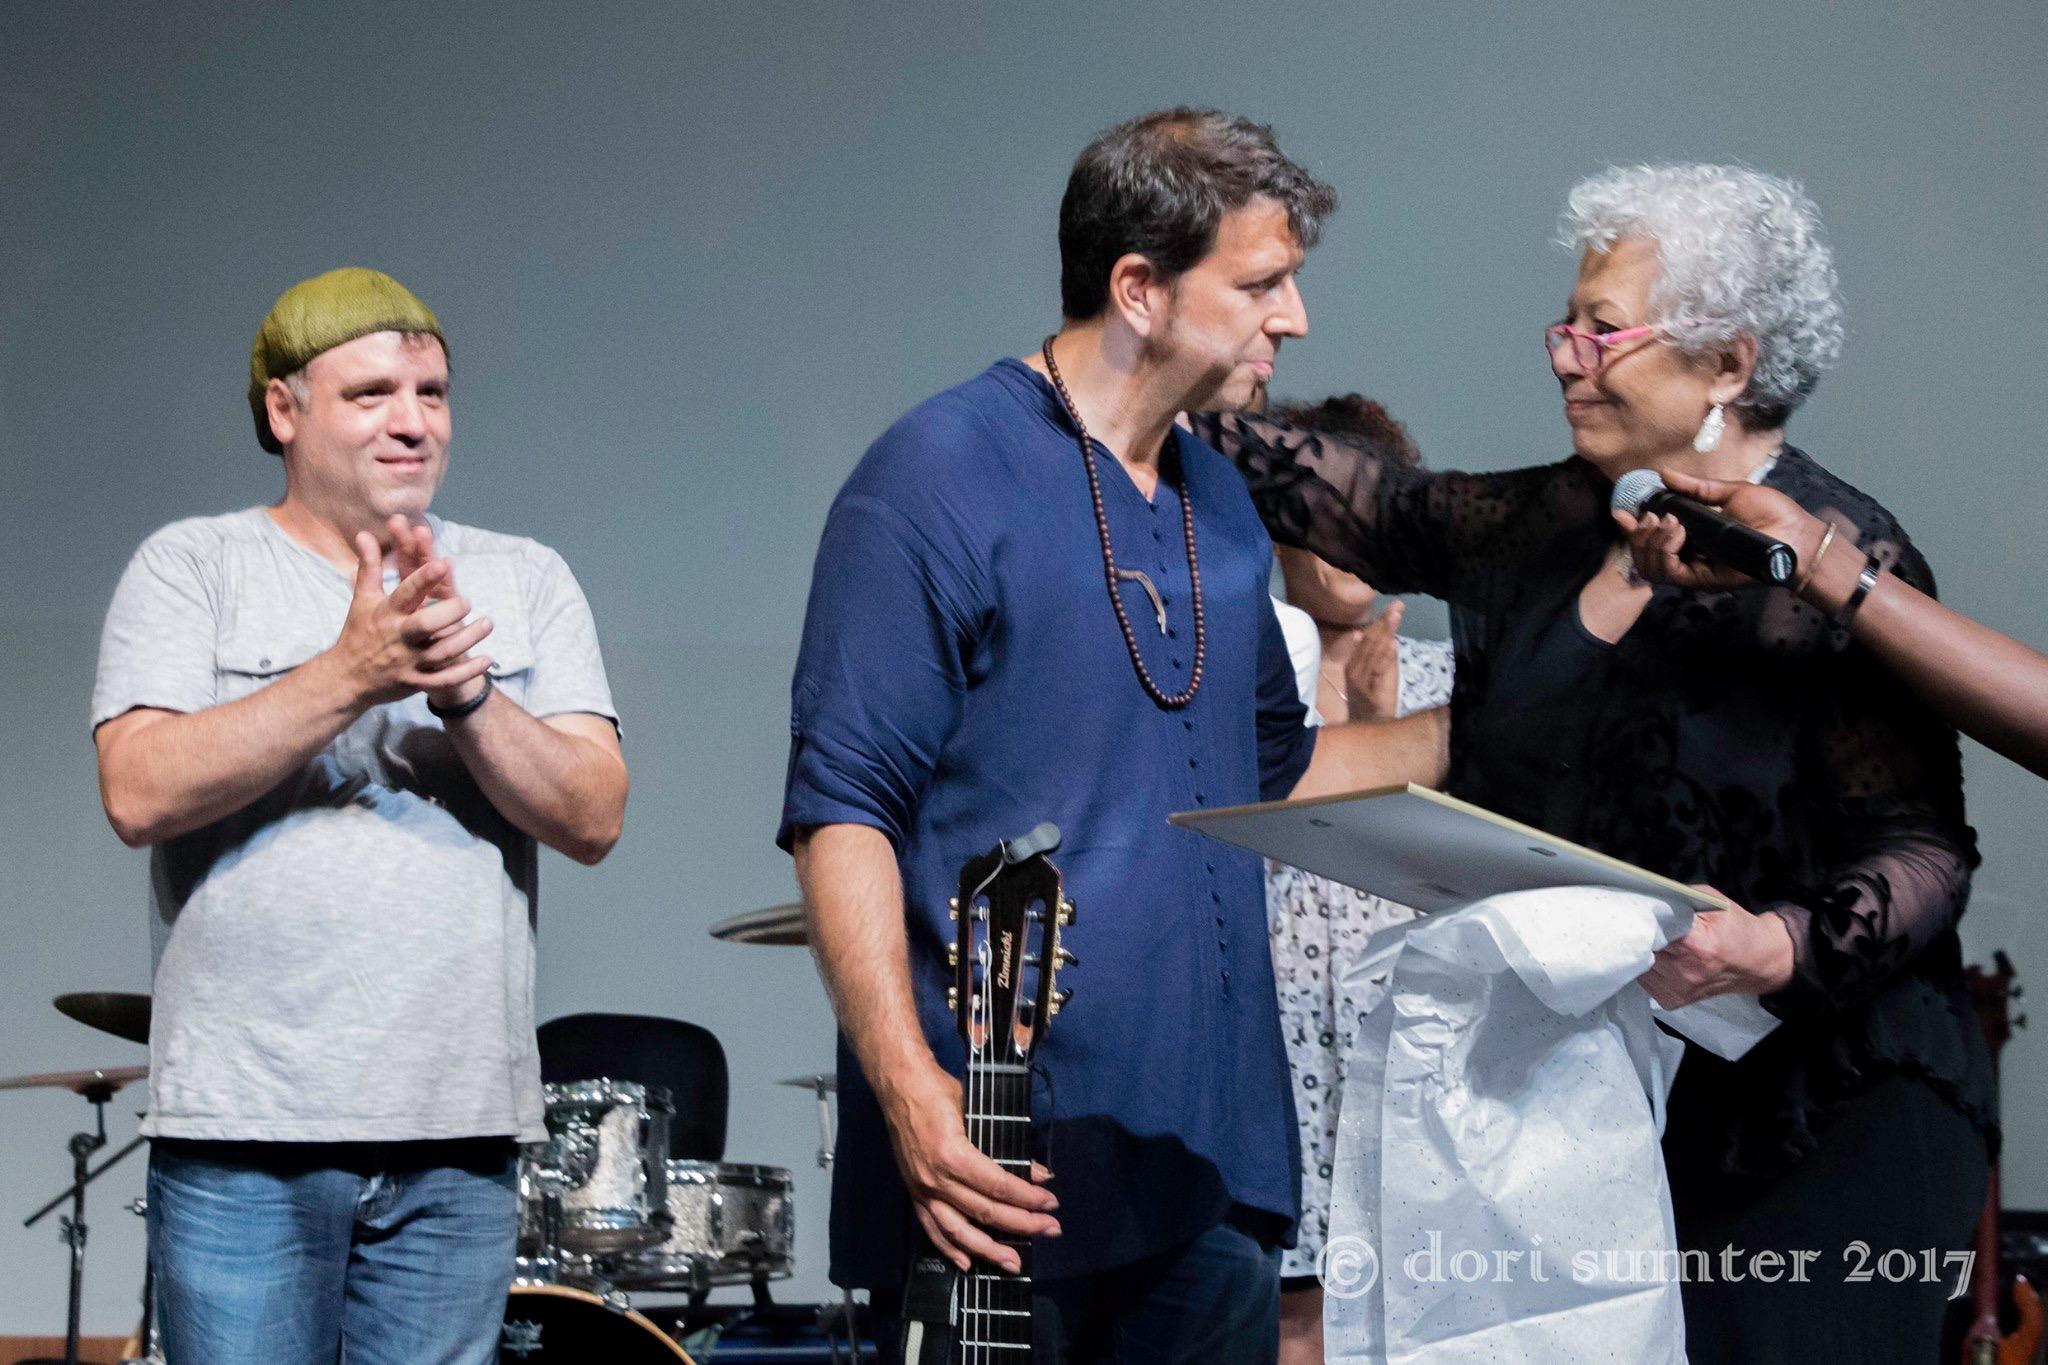 From Left: STEVE CALDWELL, Sean Blackman, Nada Dalgamouni